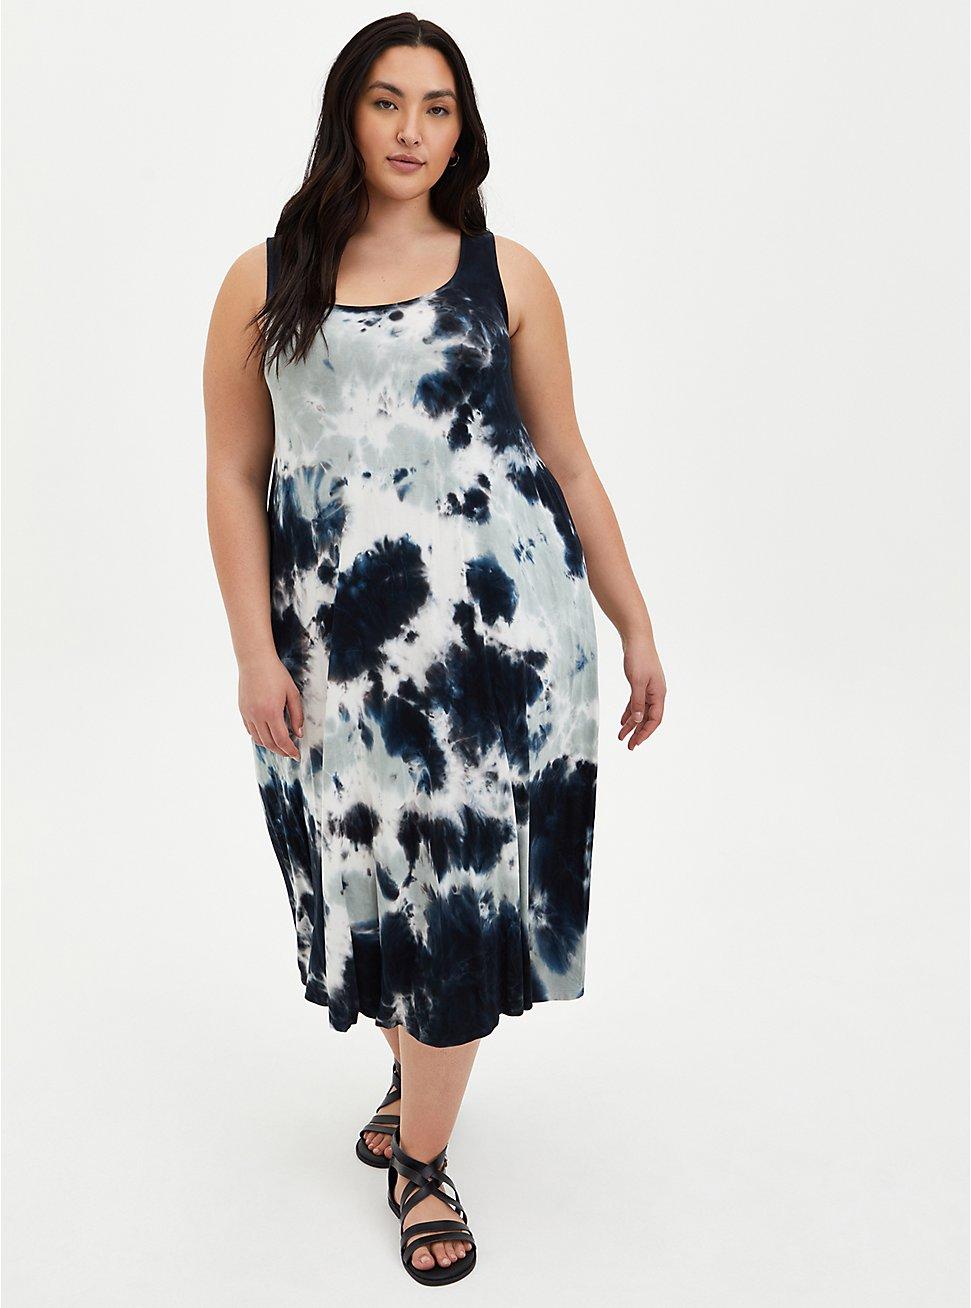 Multi Tie-Dye Super Soft Midi Dress, TIE DYE, hi-res